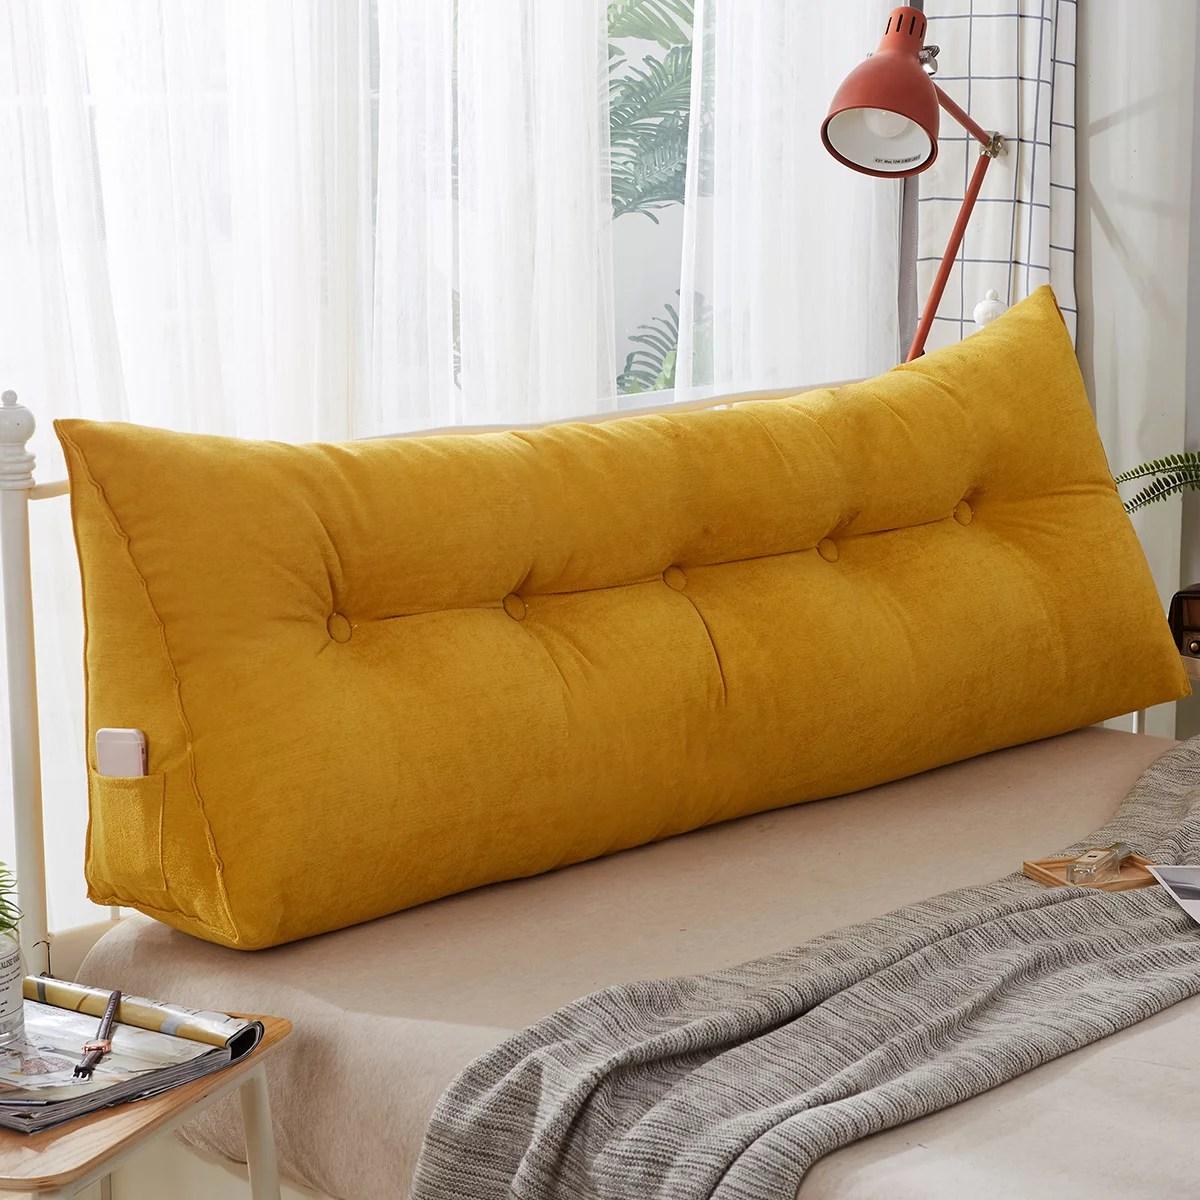 sofa cushion bedside pillow wedge triangular pillow bed backrest positioning support pillow reading pillow office lumbar pad for support head waist